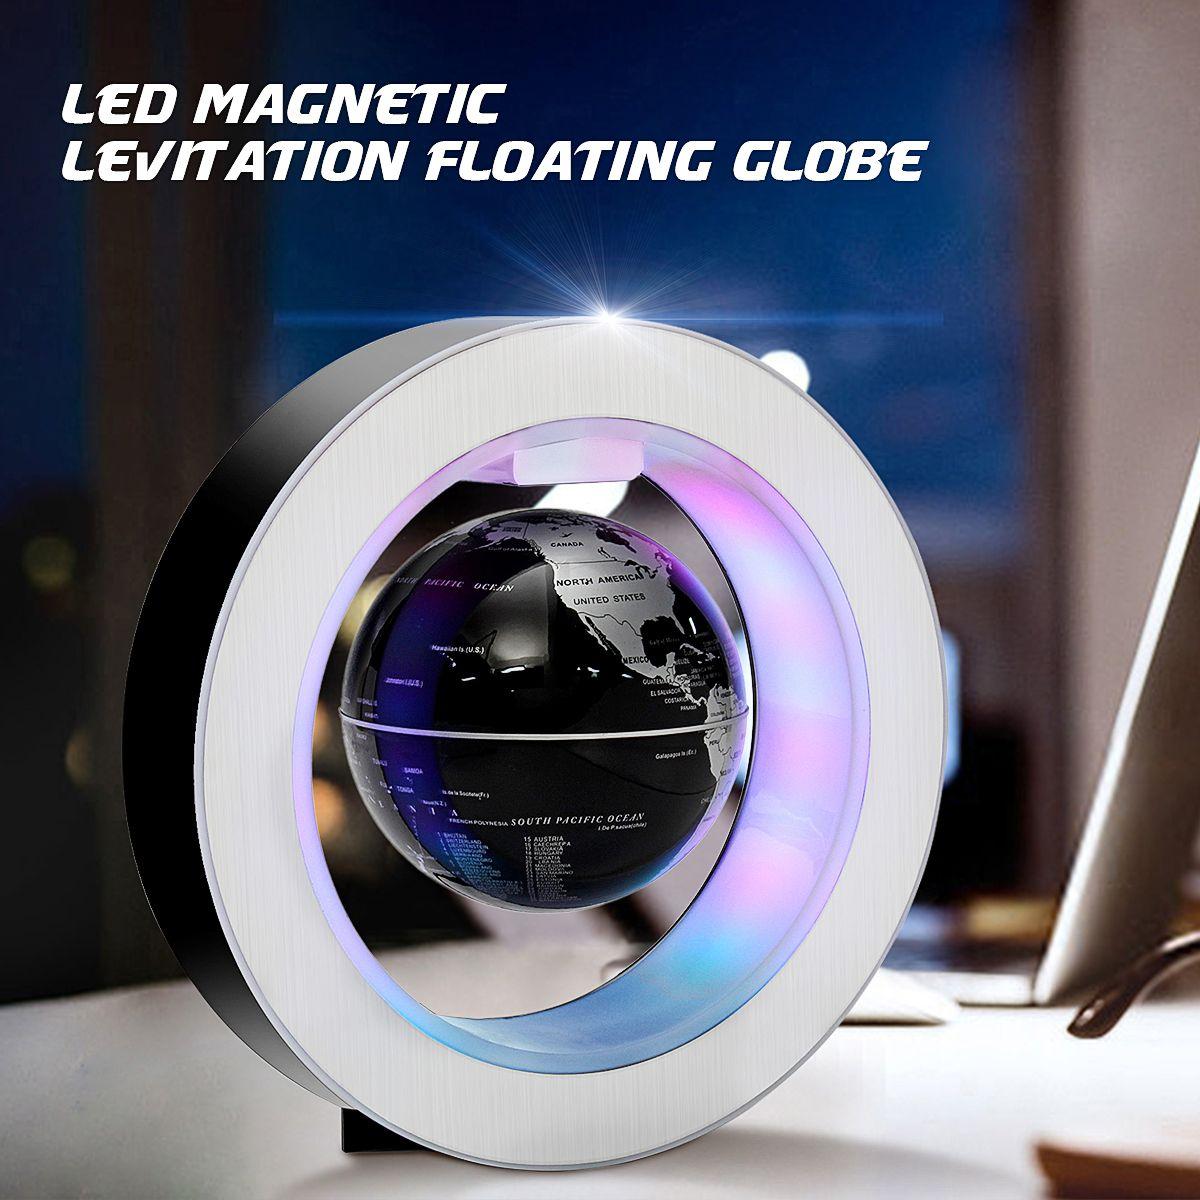 Geography World Globe Magnetic Floating Globe LED Light Levitating Rotating Tellurion World Map School Office Supply Home Decor